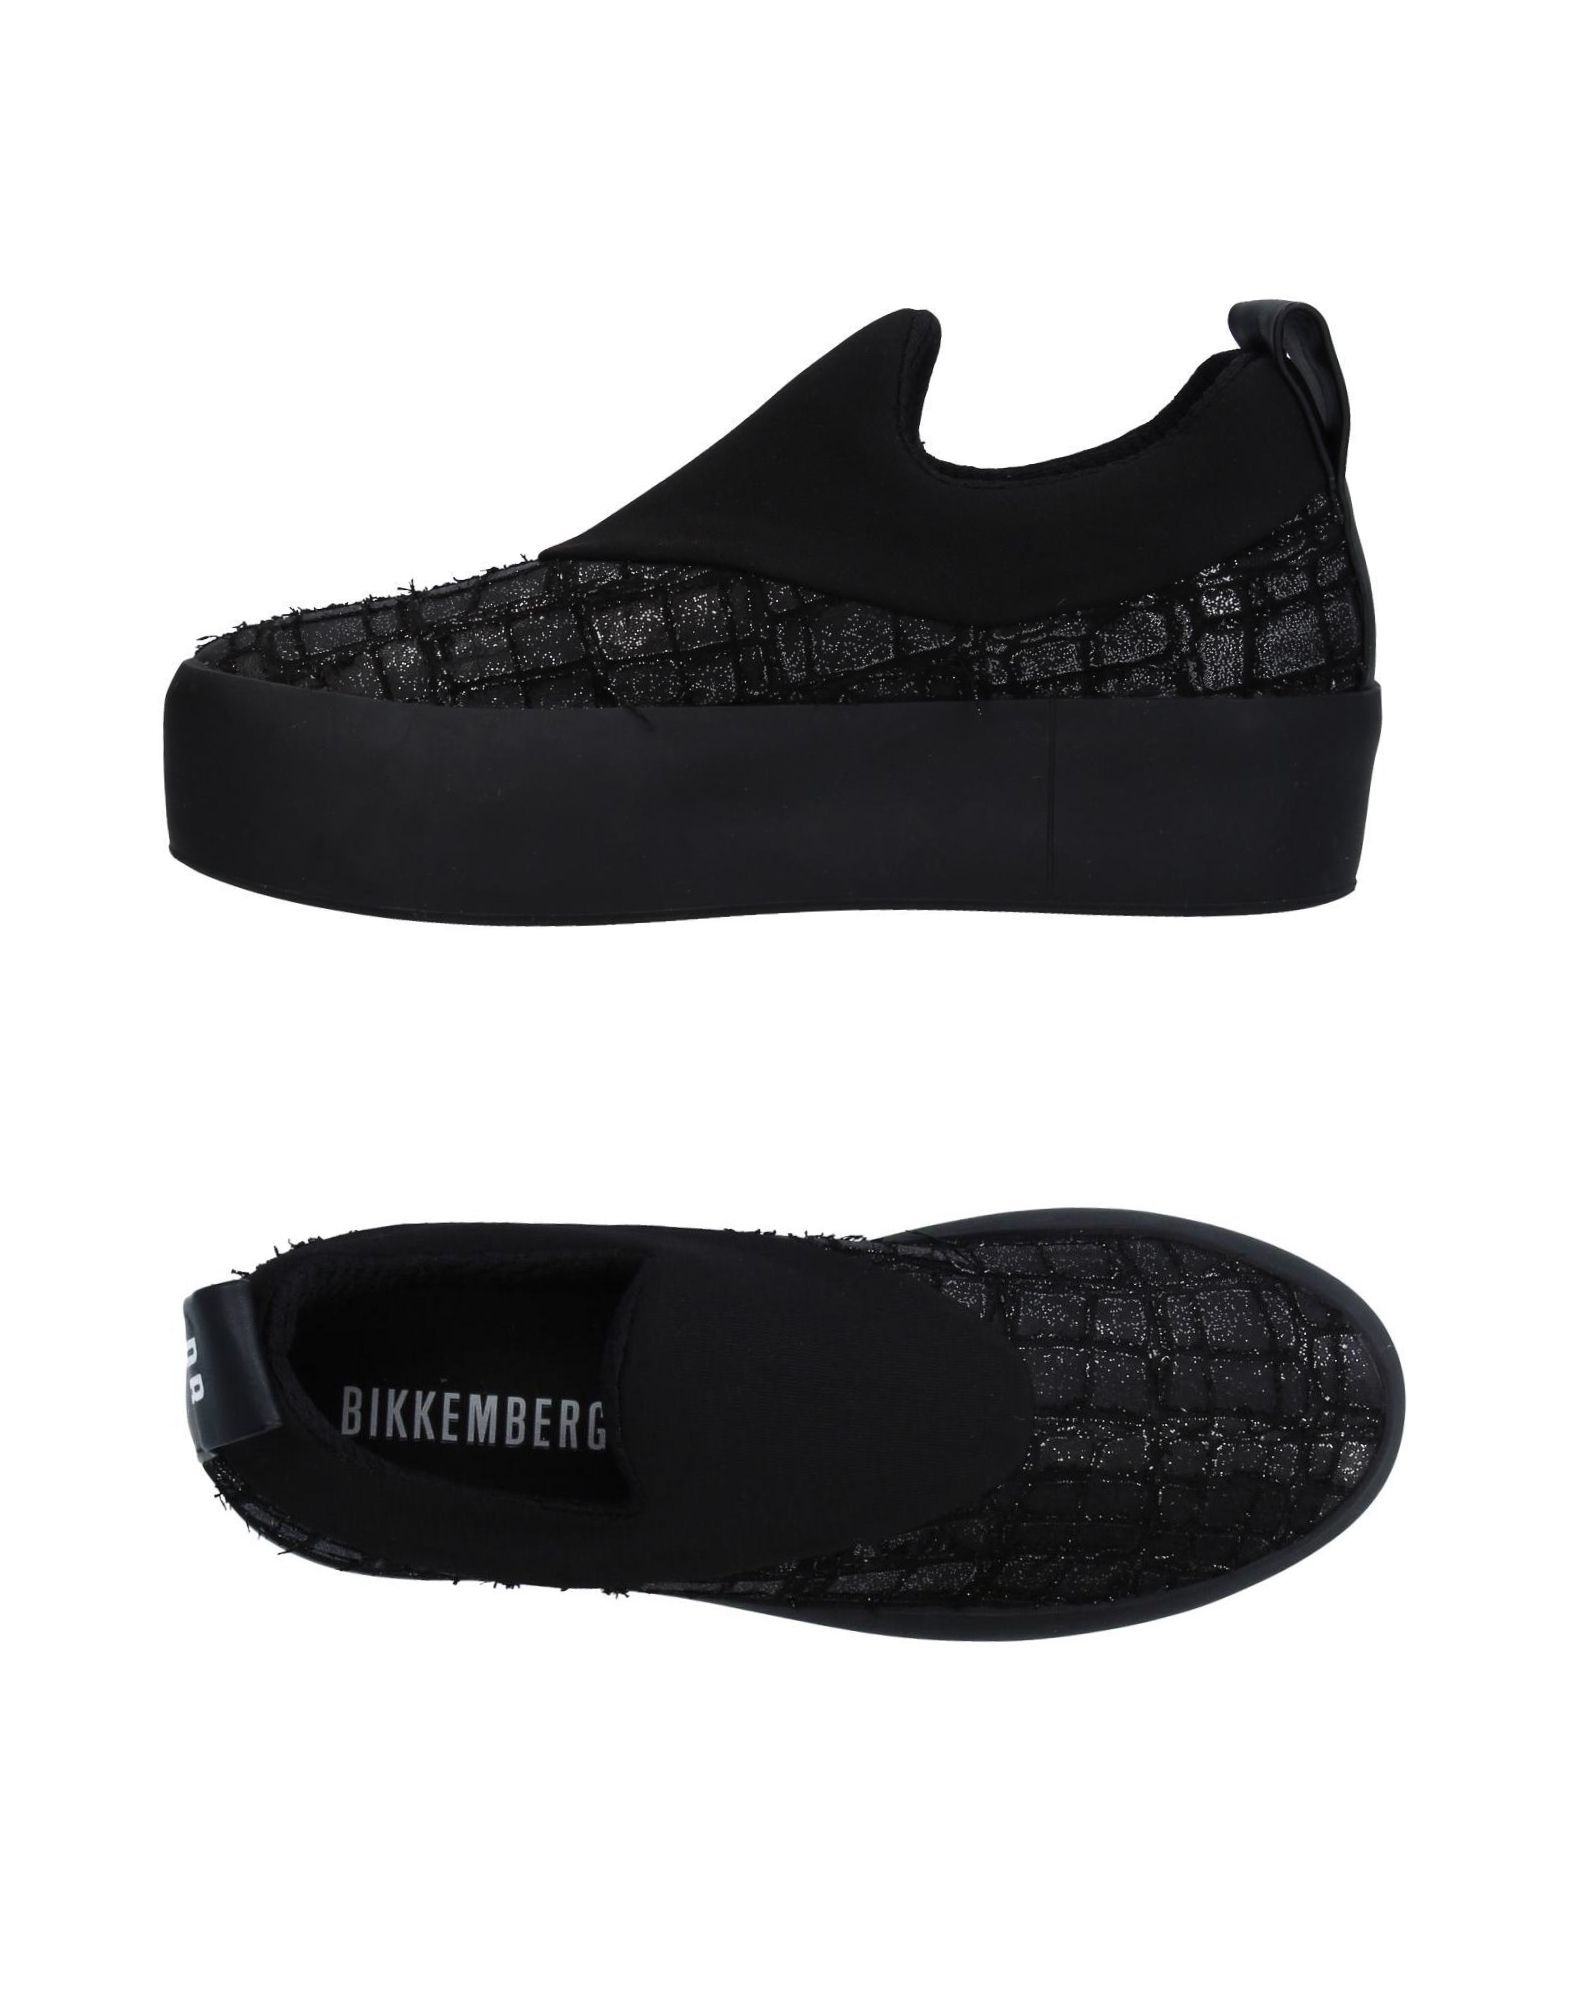 BIKKEMBERGS Низкие кеды и кроссовки bikkembergs низкие кеды и кроссовки